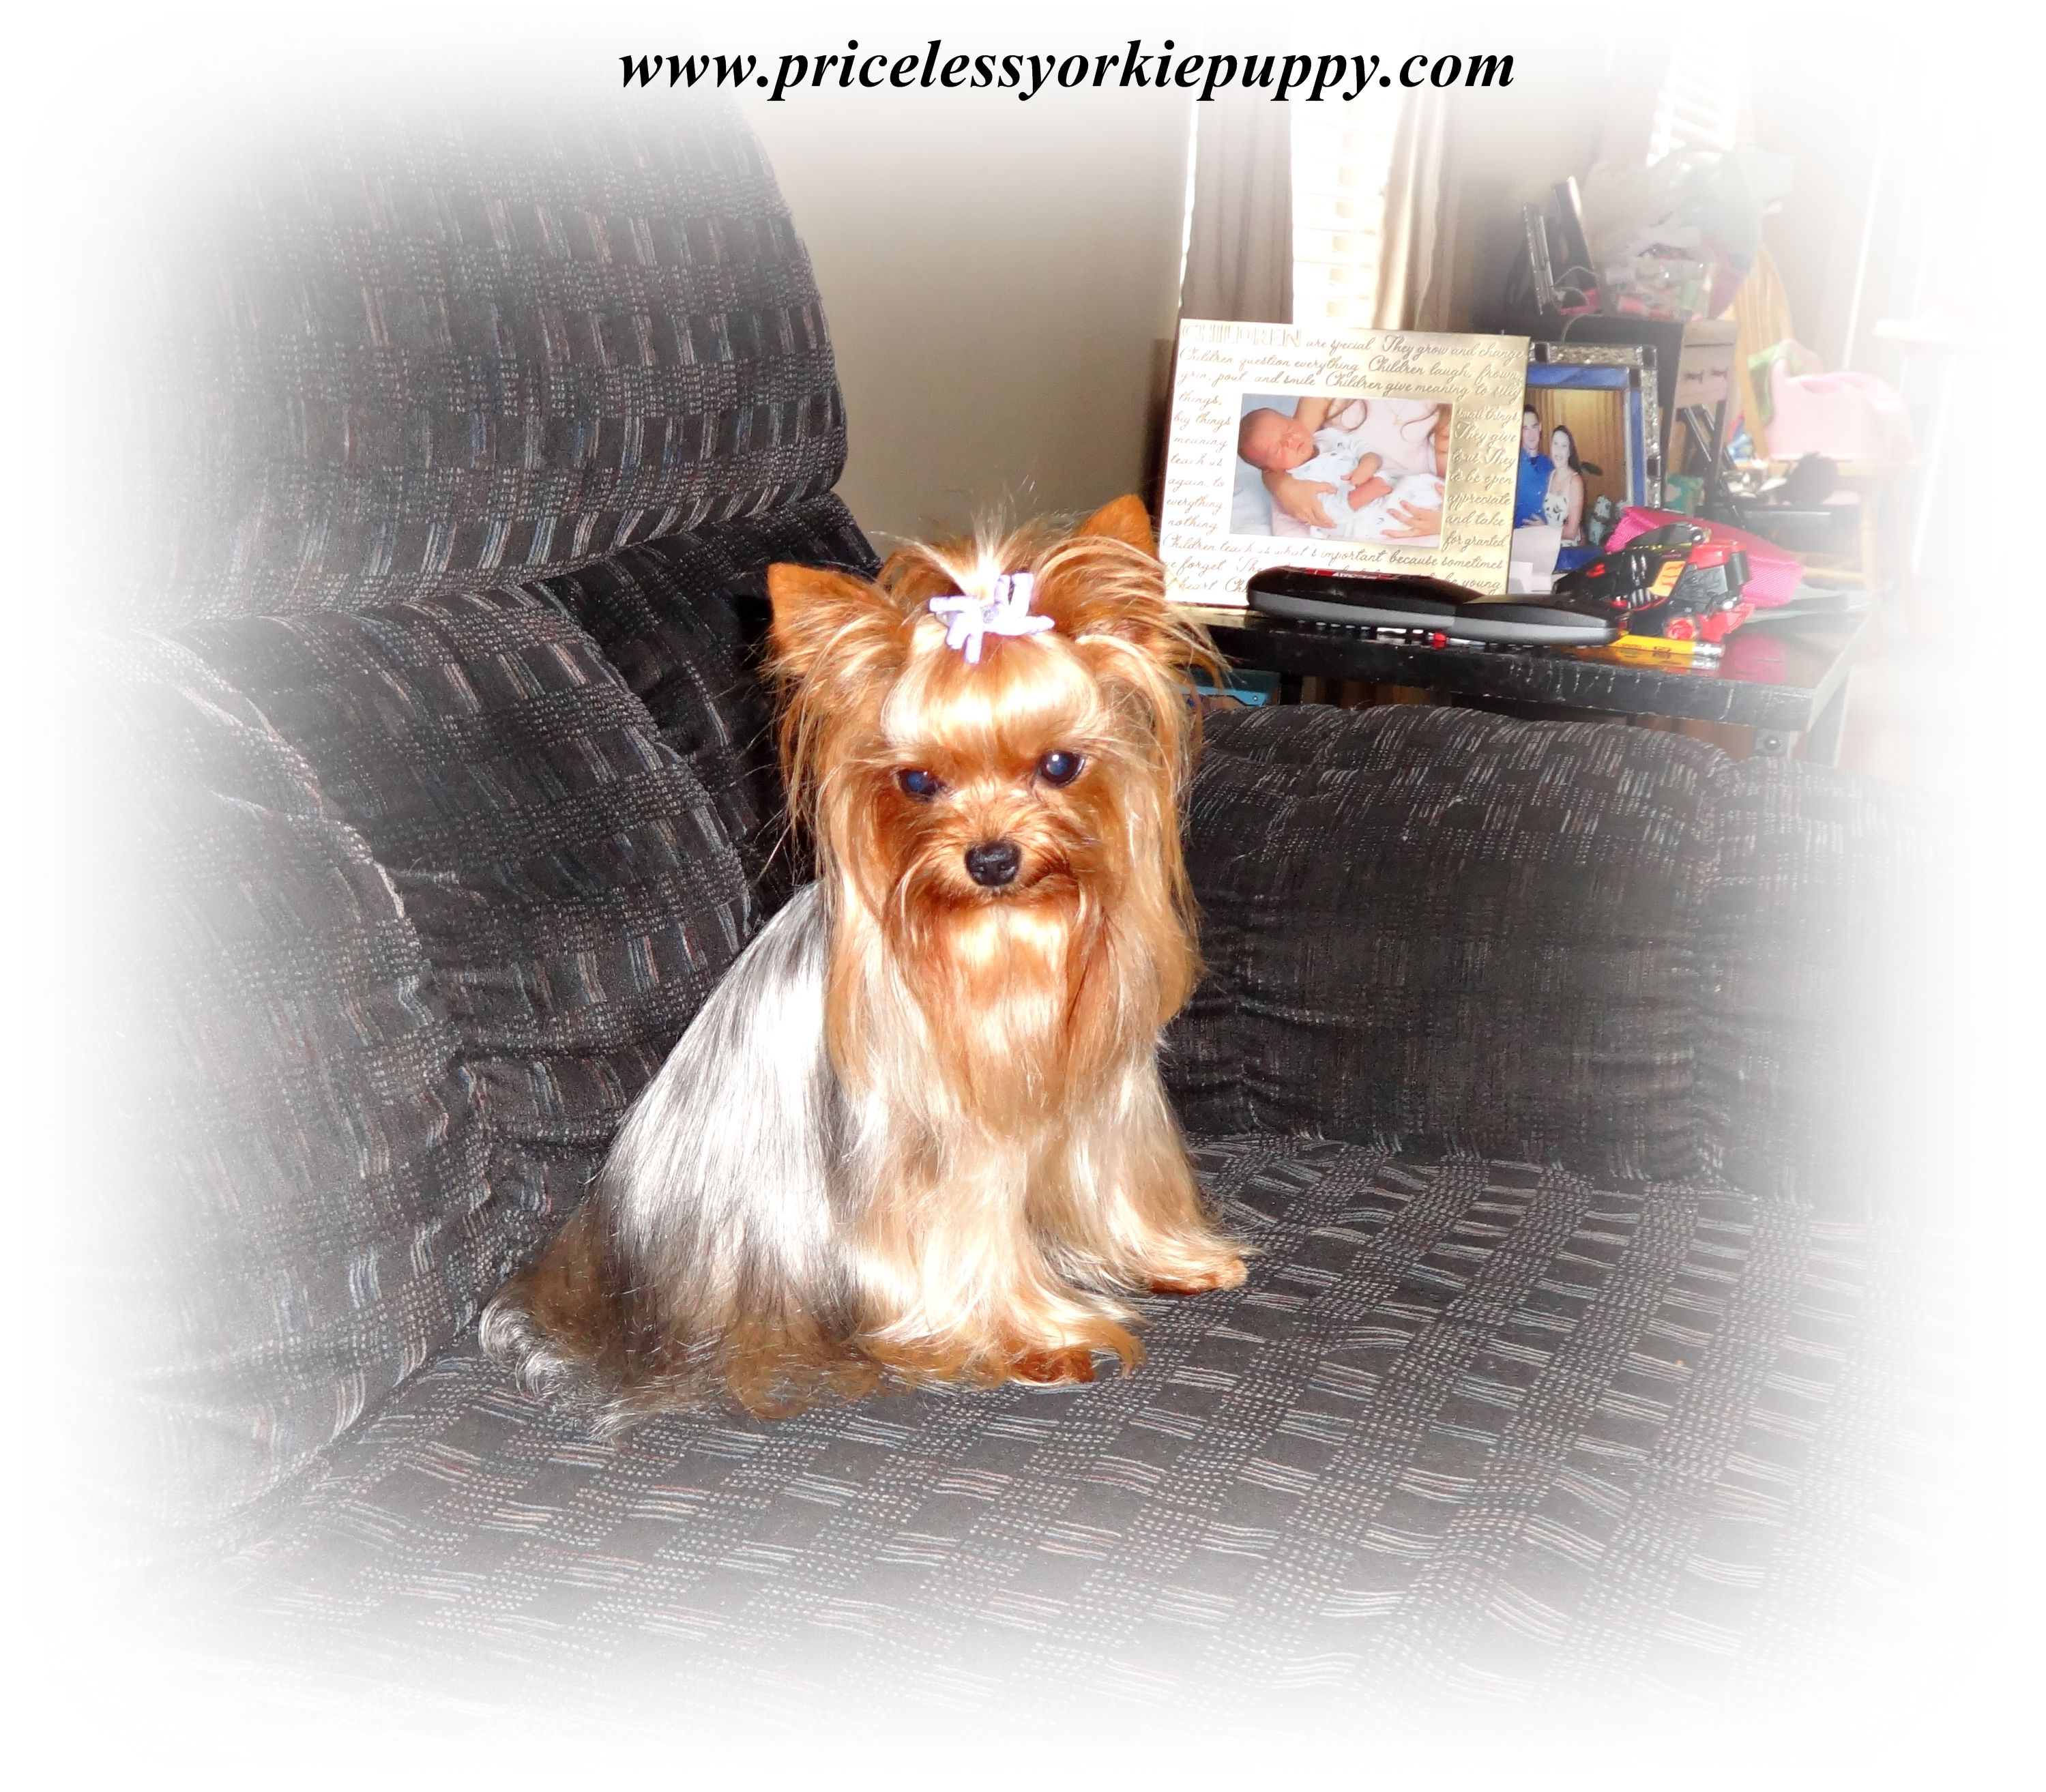 Michigan Teacup Yorkshire Terrier Puppy Breeder Tiny Teacup Yorkie